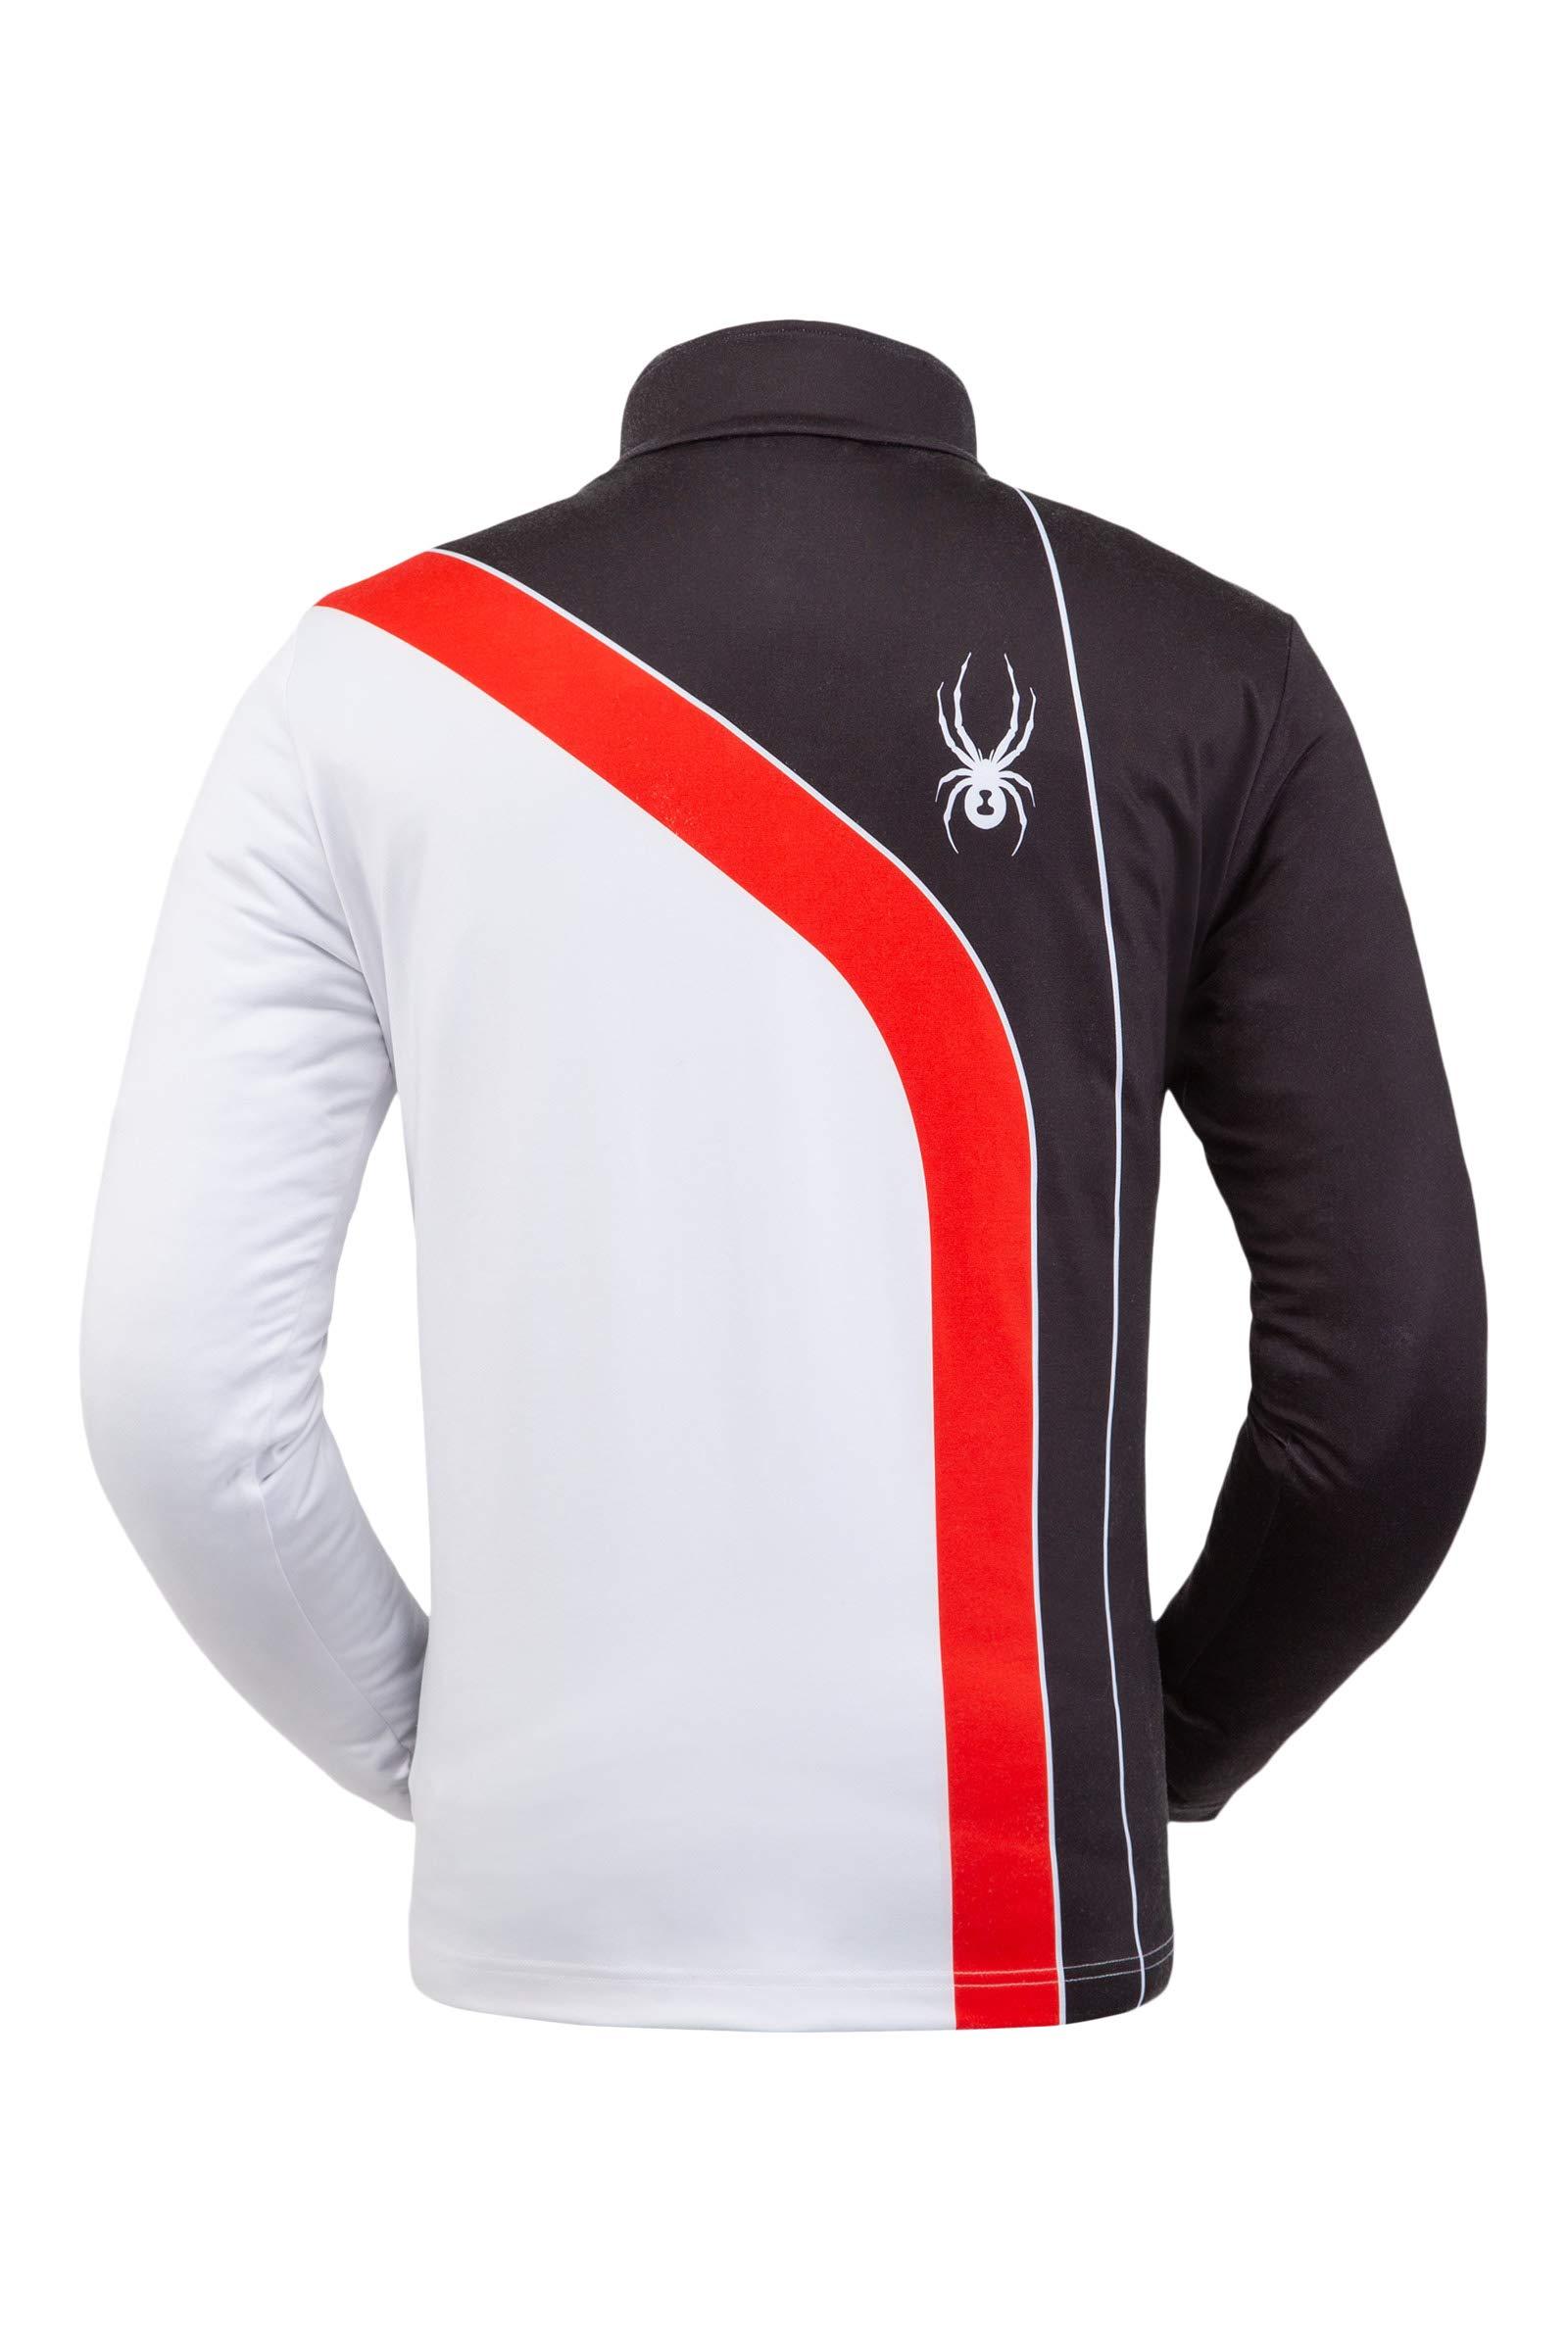 Spyder Men's Rival Zip T-Neck – Pullover Long Sleeve Active Shirt